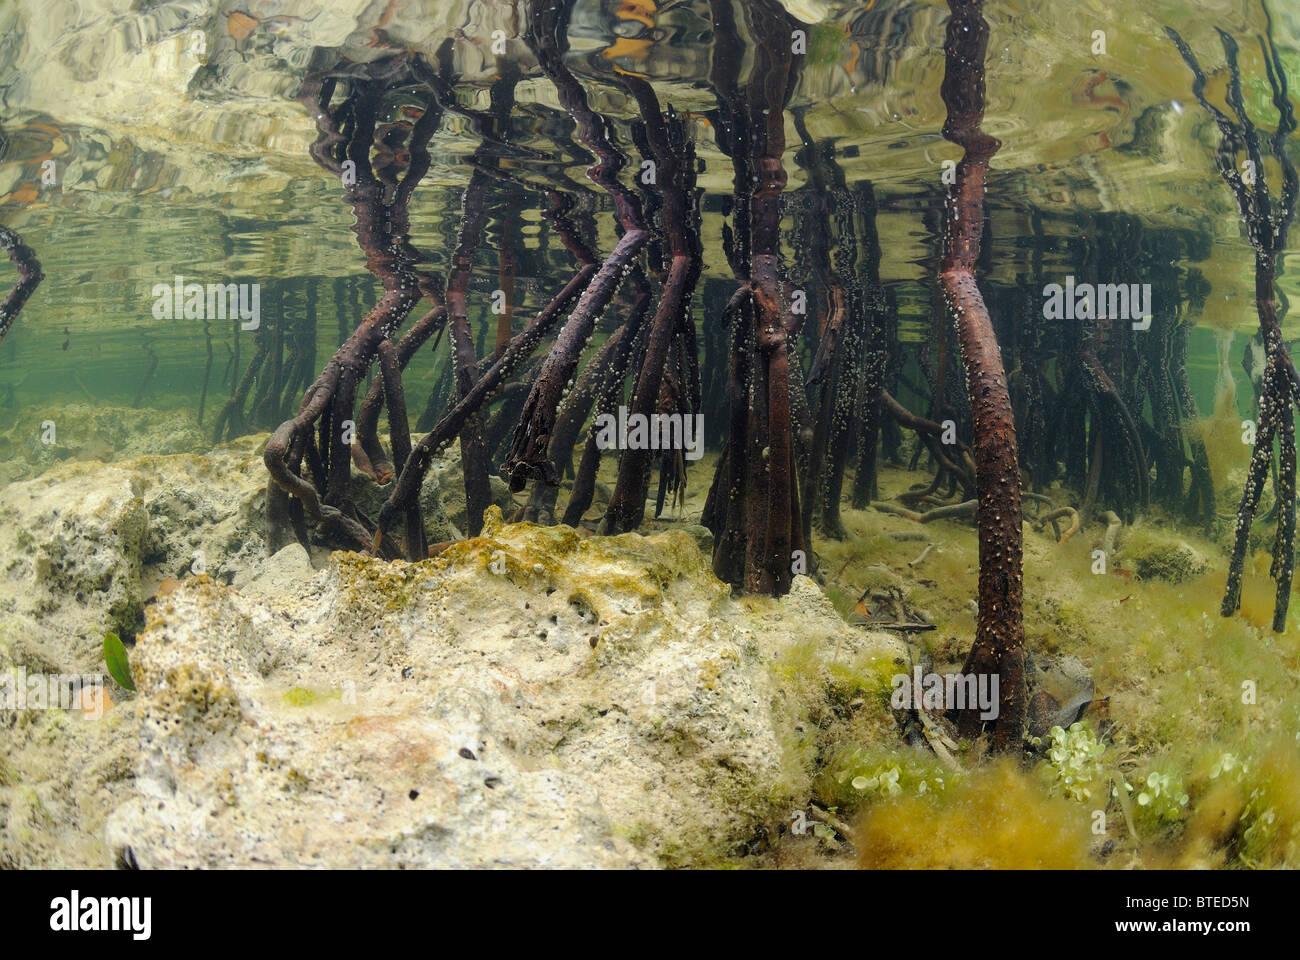 Tree Roots Red Mangrove Underwater Stock Photos Amp Tree